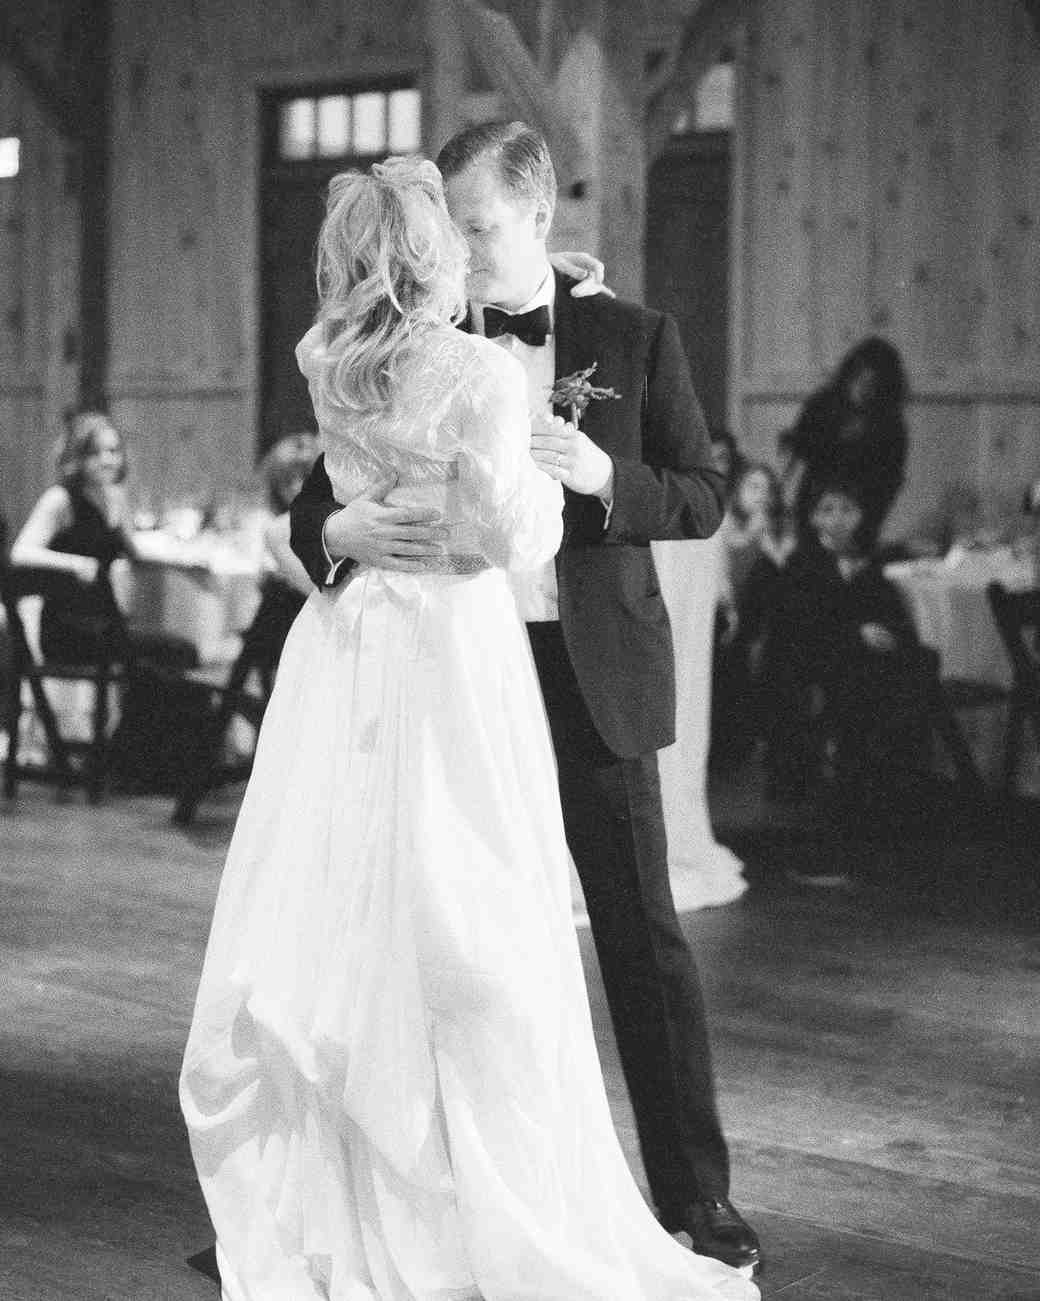 tiffany-nicholas-wedding-dance-146-s111339-0714.jpg